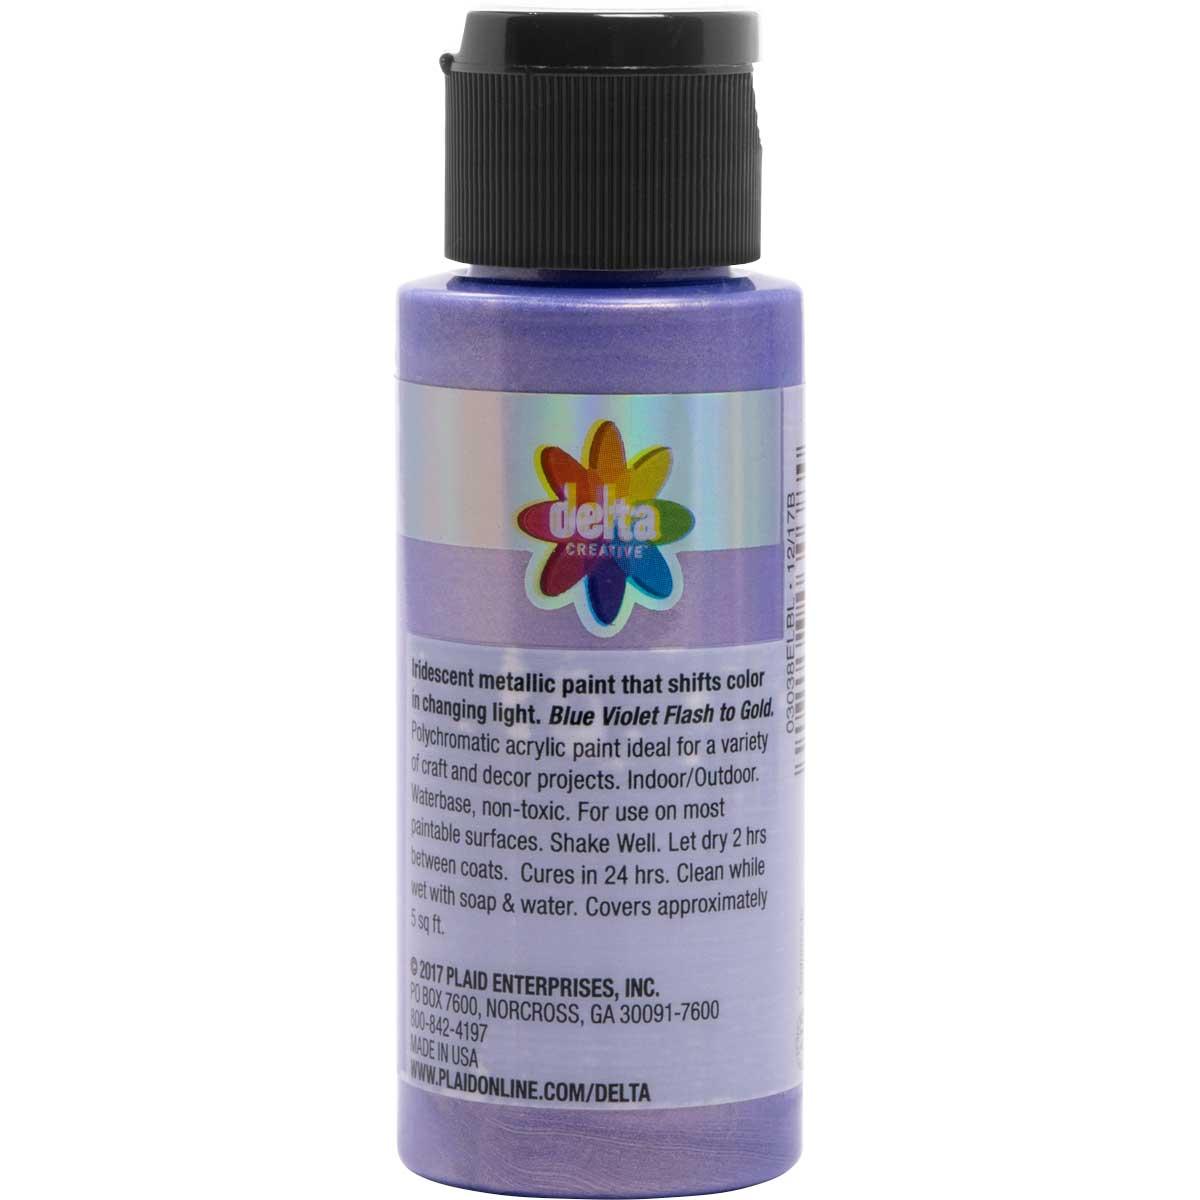 Delta Ceramcoat ® Acrylic Paint - Flash Metallic Blue Violet, 2 oz. - 03038